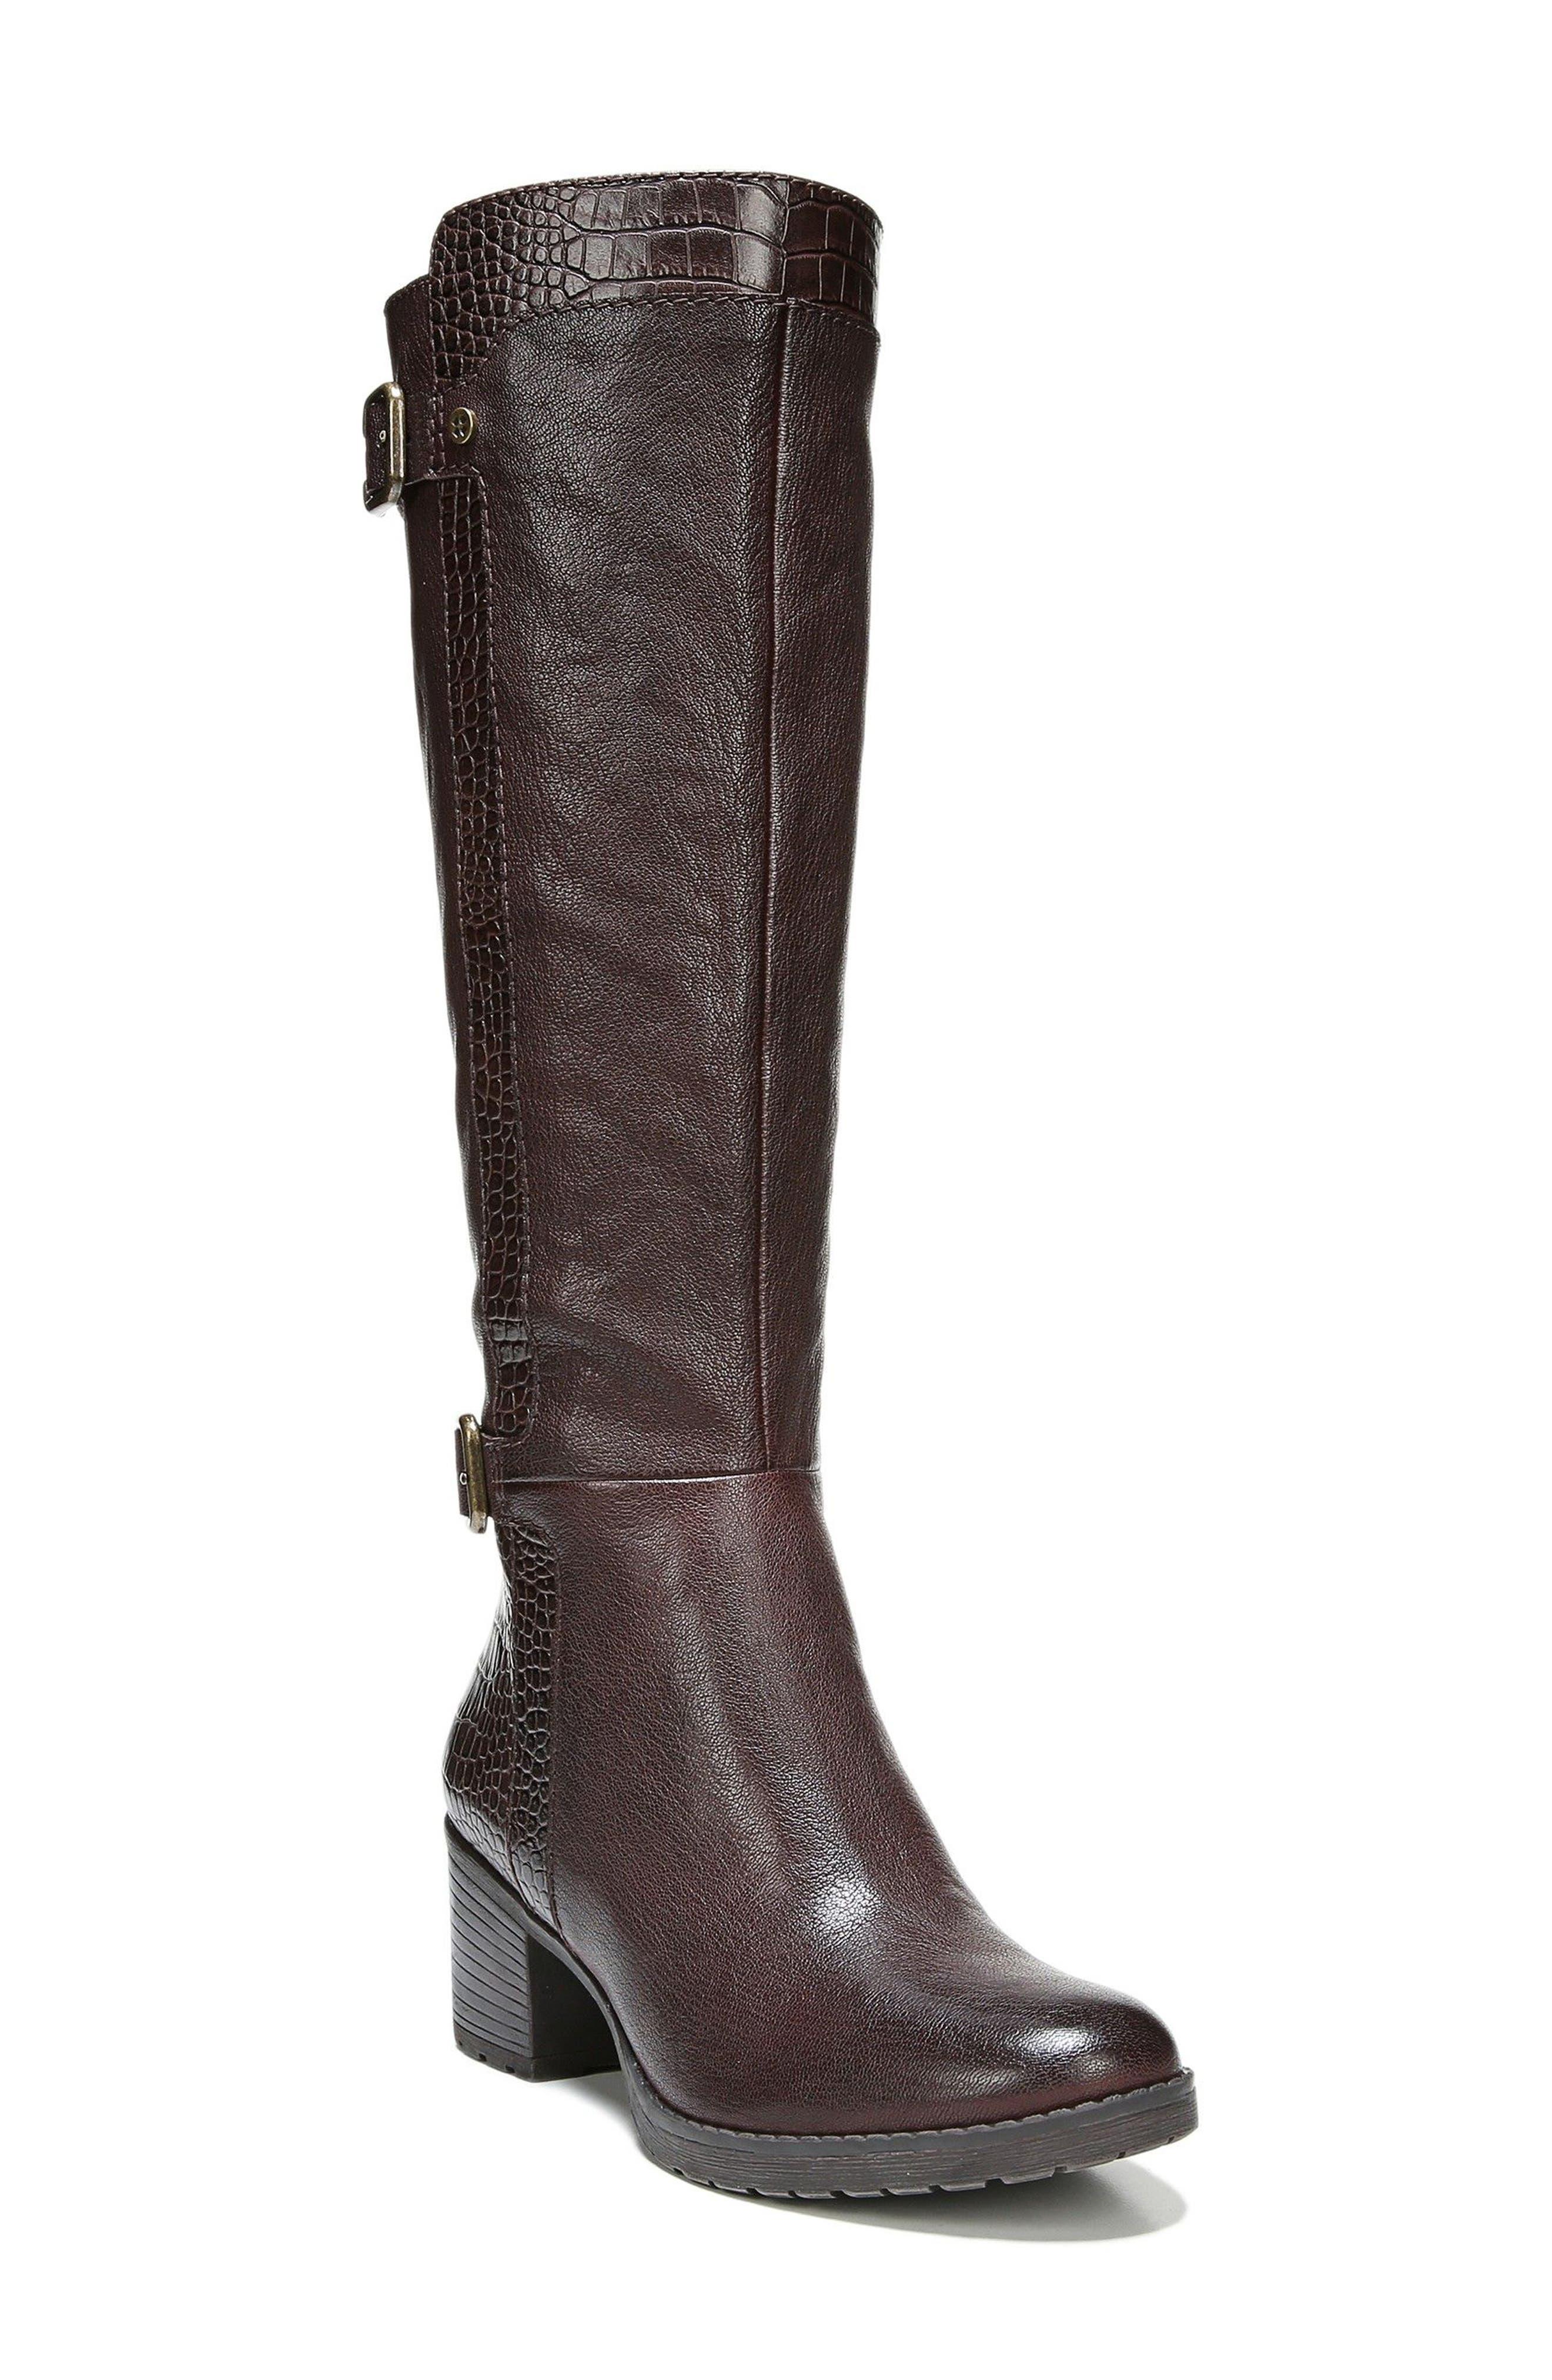 Alternate Image 1 Selected - Naturalizer Rozene Knee High Boot (Women)